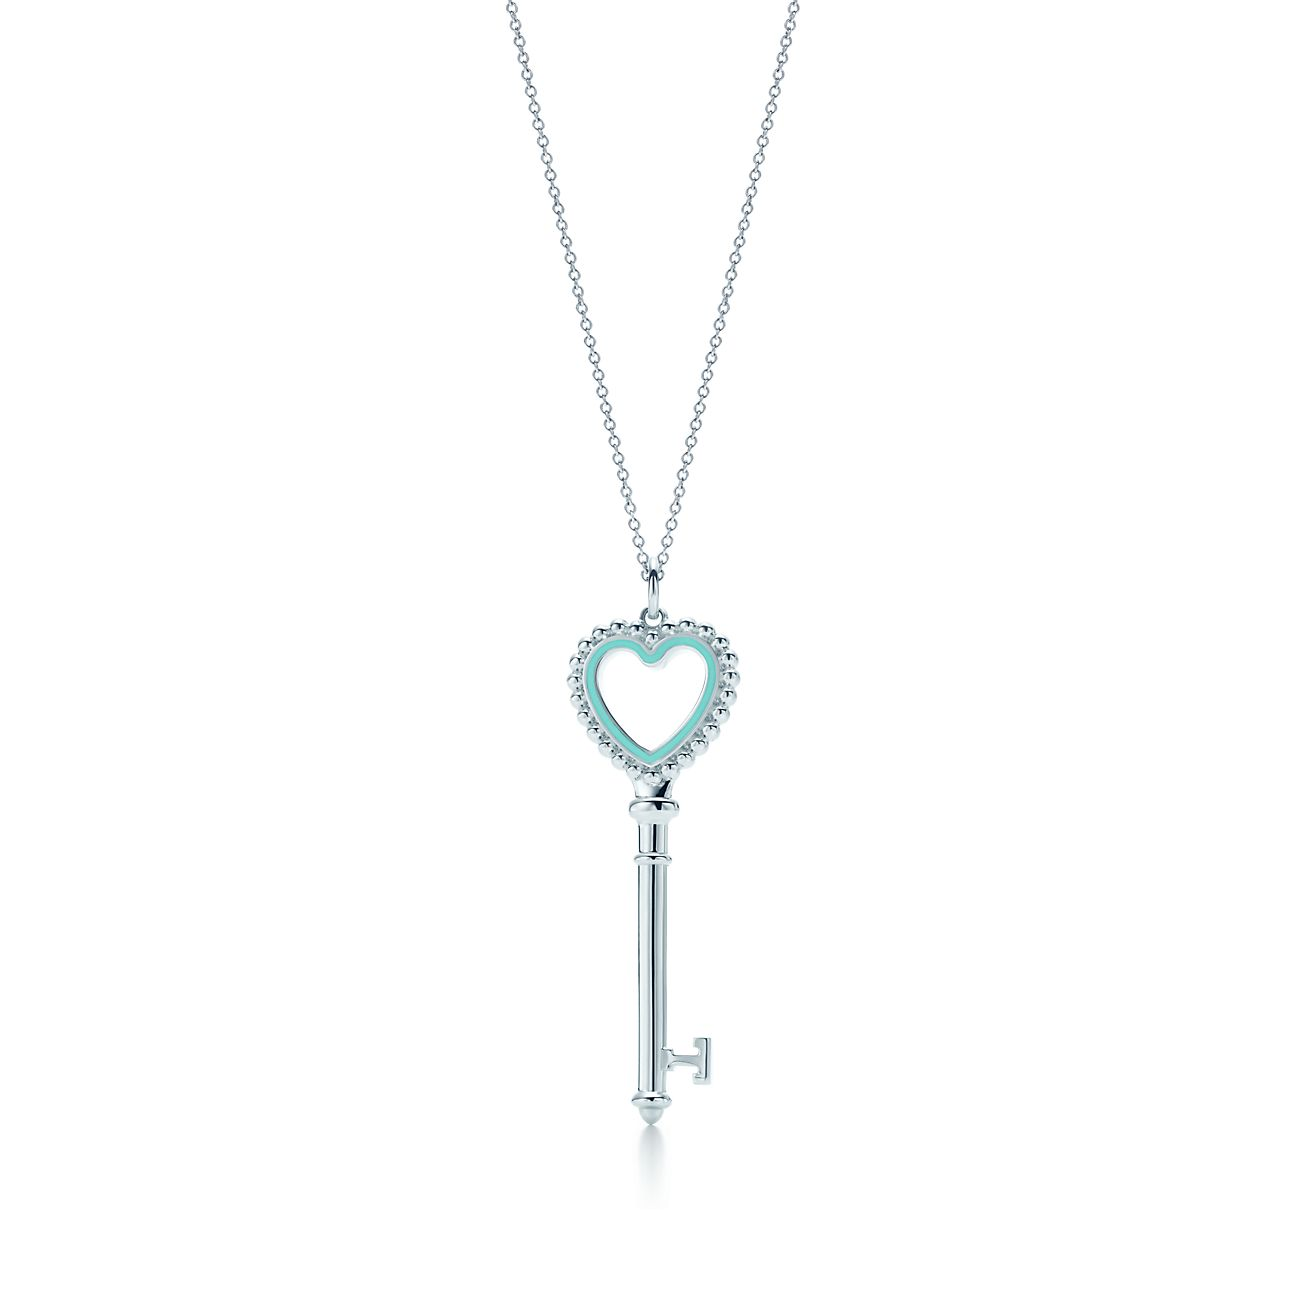 Tiffany keys beaded heart key pendant in silver with enamel finish tiffany keysbeaded heart key pendant aloadofball Choice Image